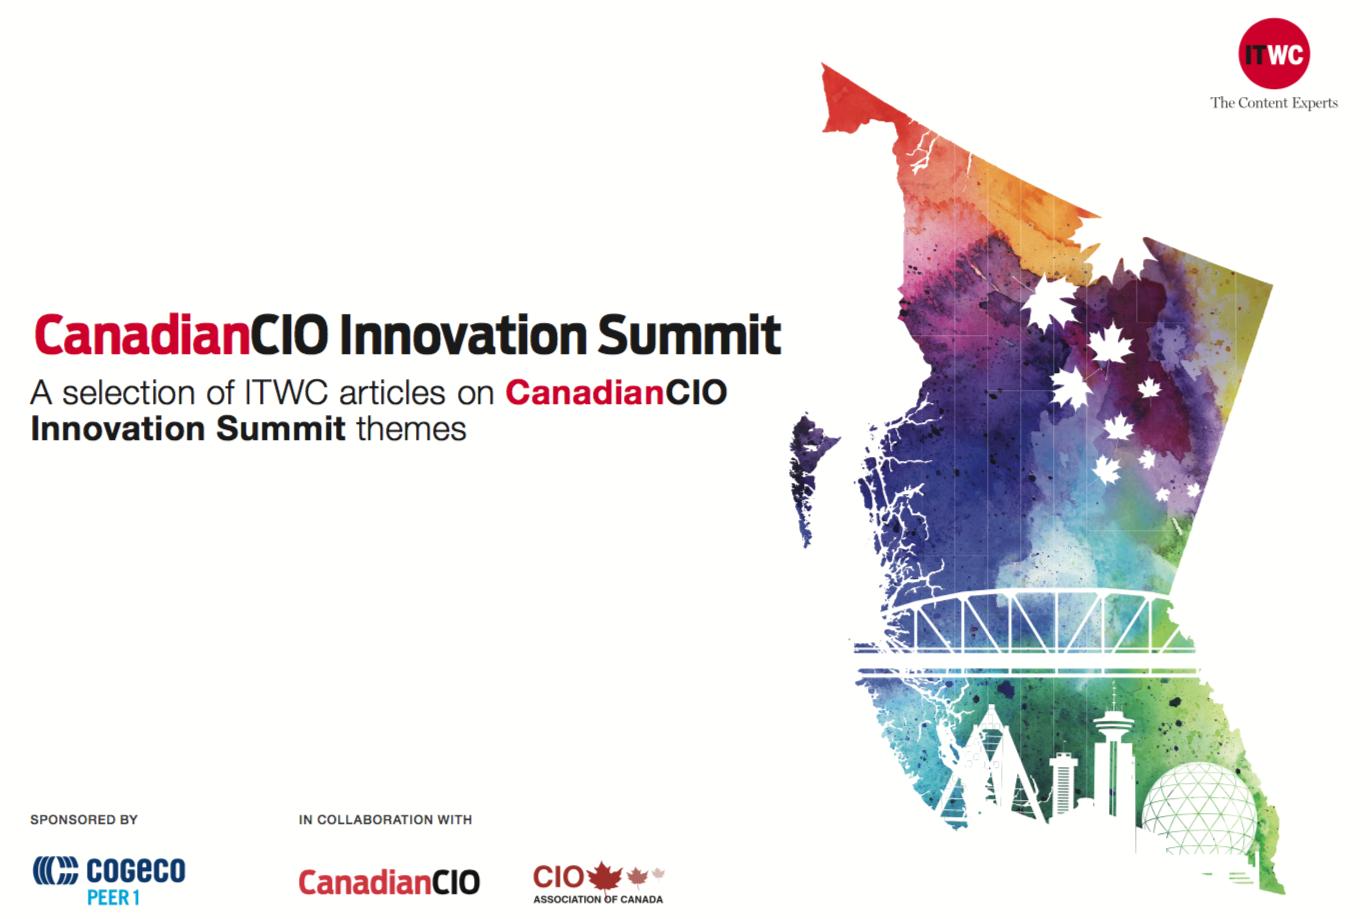 CanadianCIO Innovation Summit